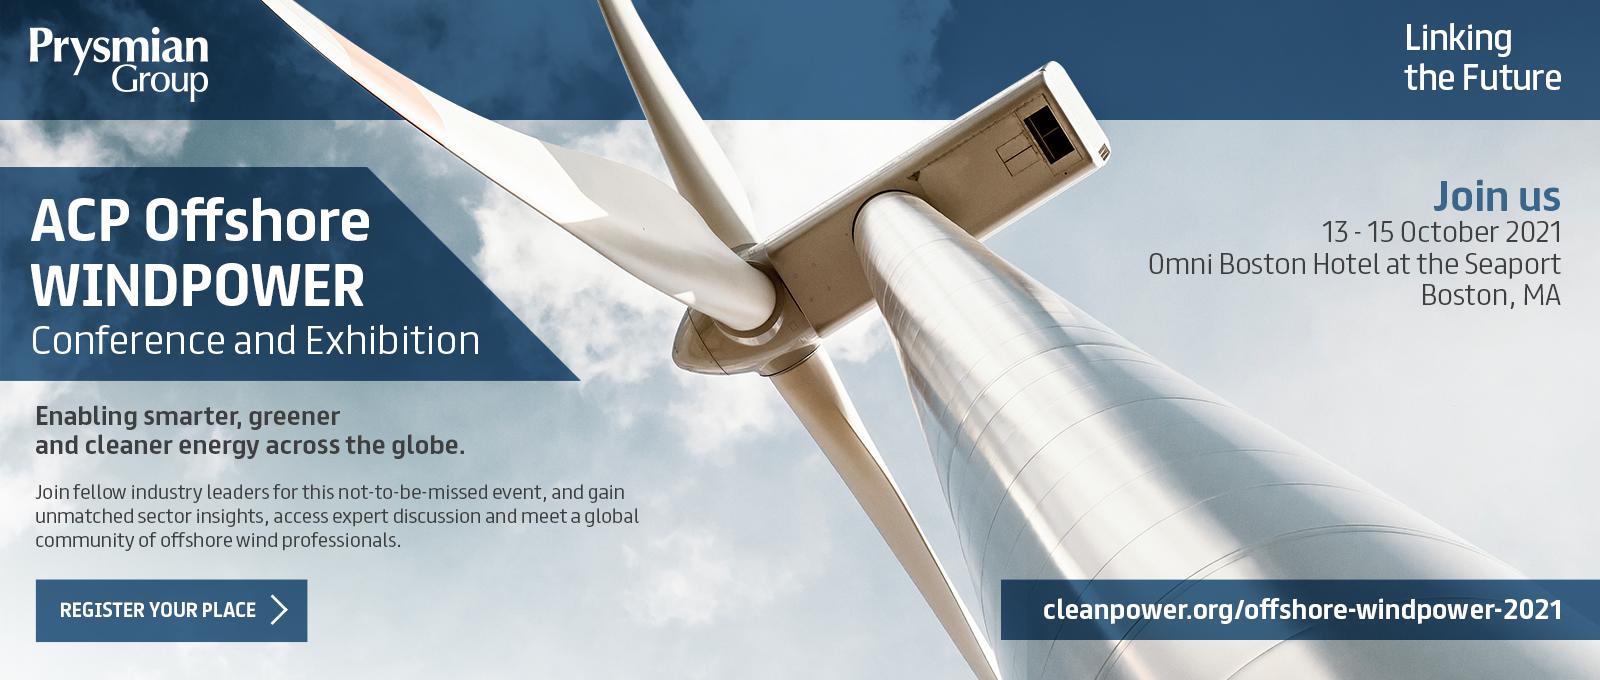 Prysmian Group | Cables, Energy & Telecom Solutions